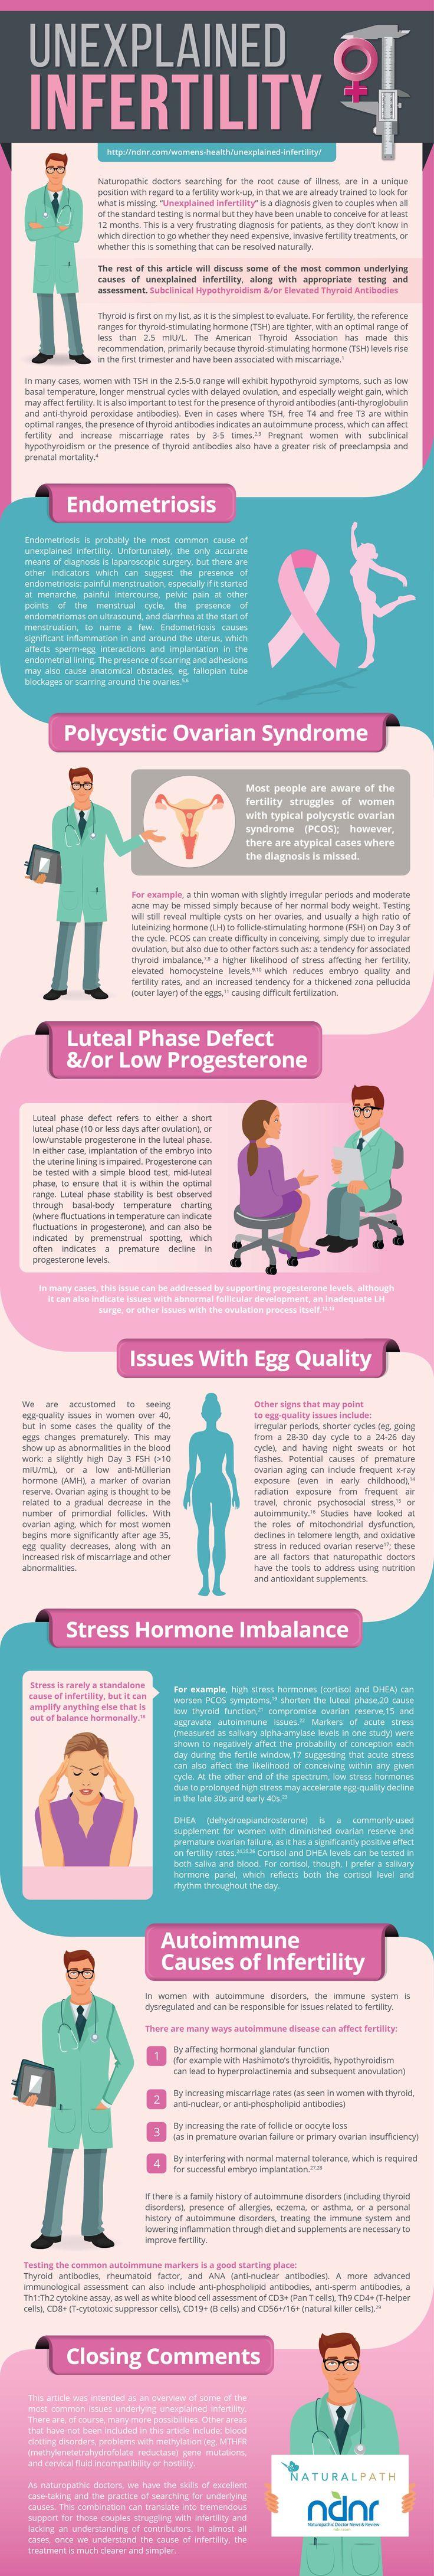 Unexplained Infertility Infographic